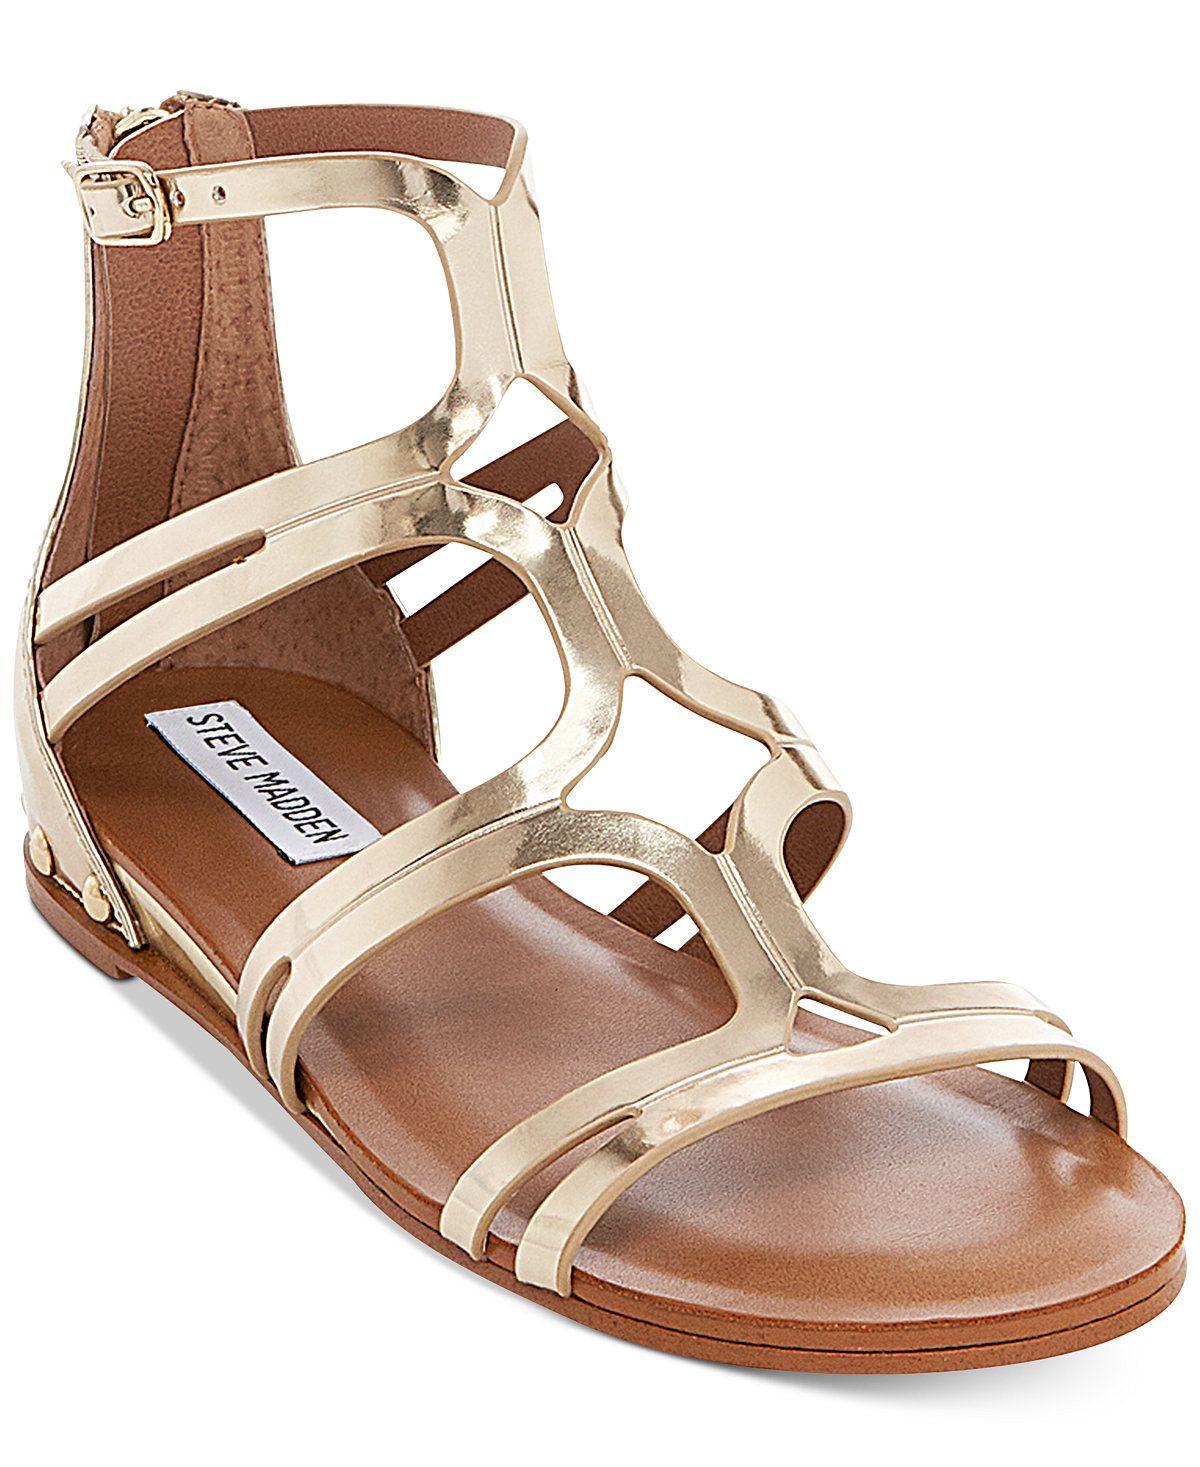 fb9c33a6019 Steve Madden Women's Delta Gladiator Sandals - Sandals - Shoes ...